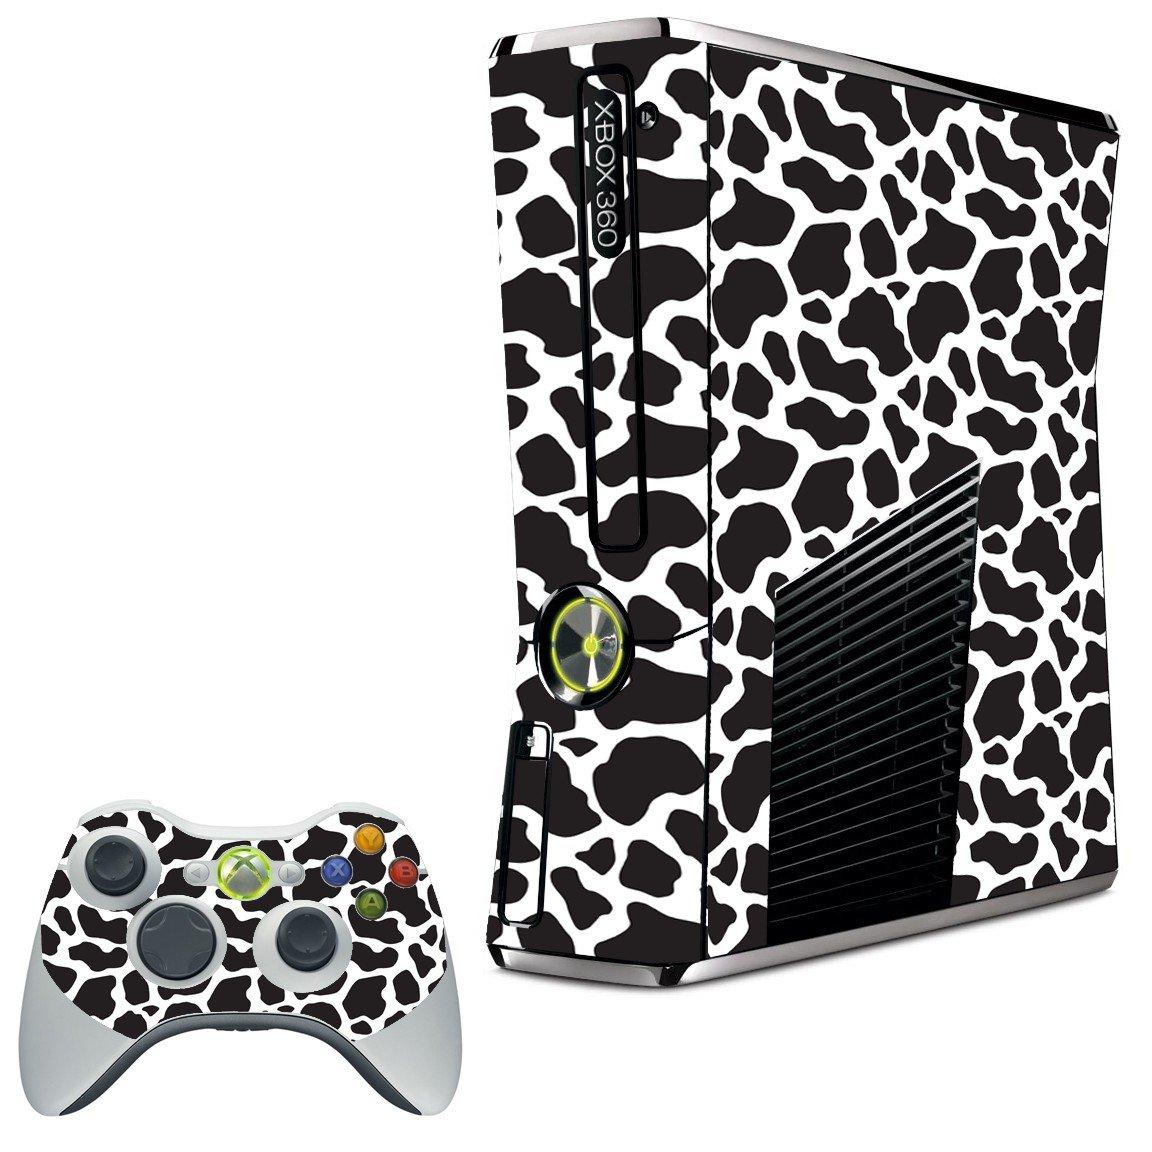 BLACK GIRAFFE XBOX 360 SLIM GAME CONSOLE SKIN